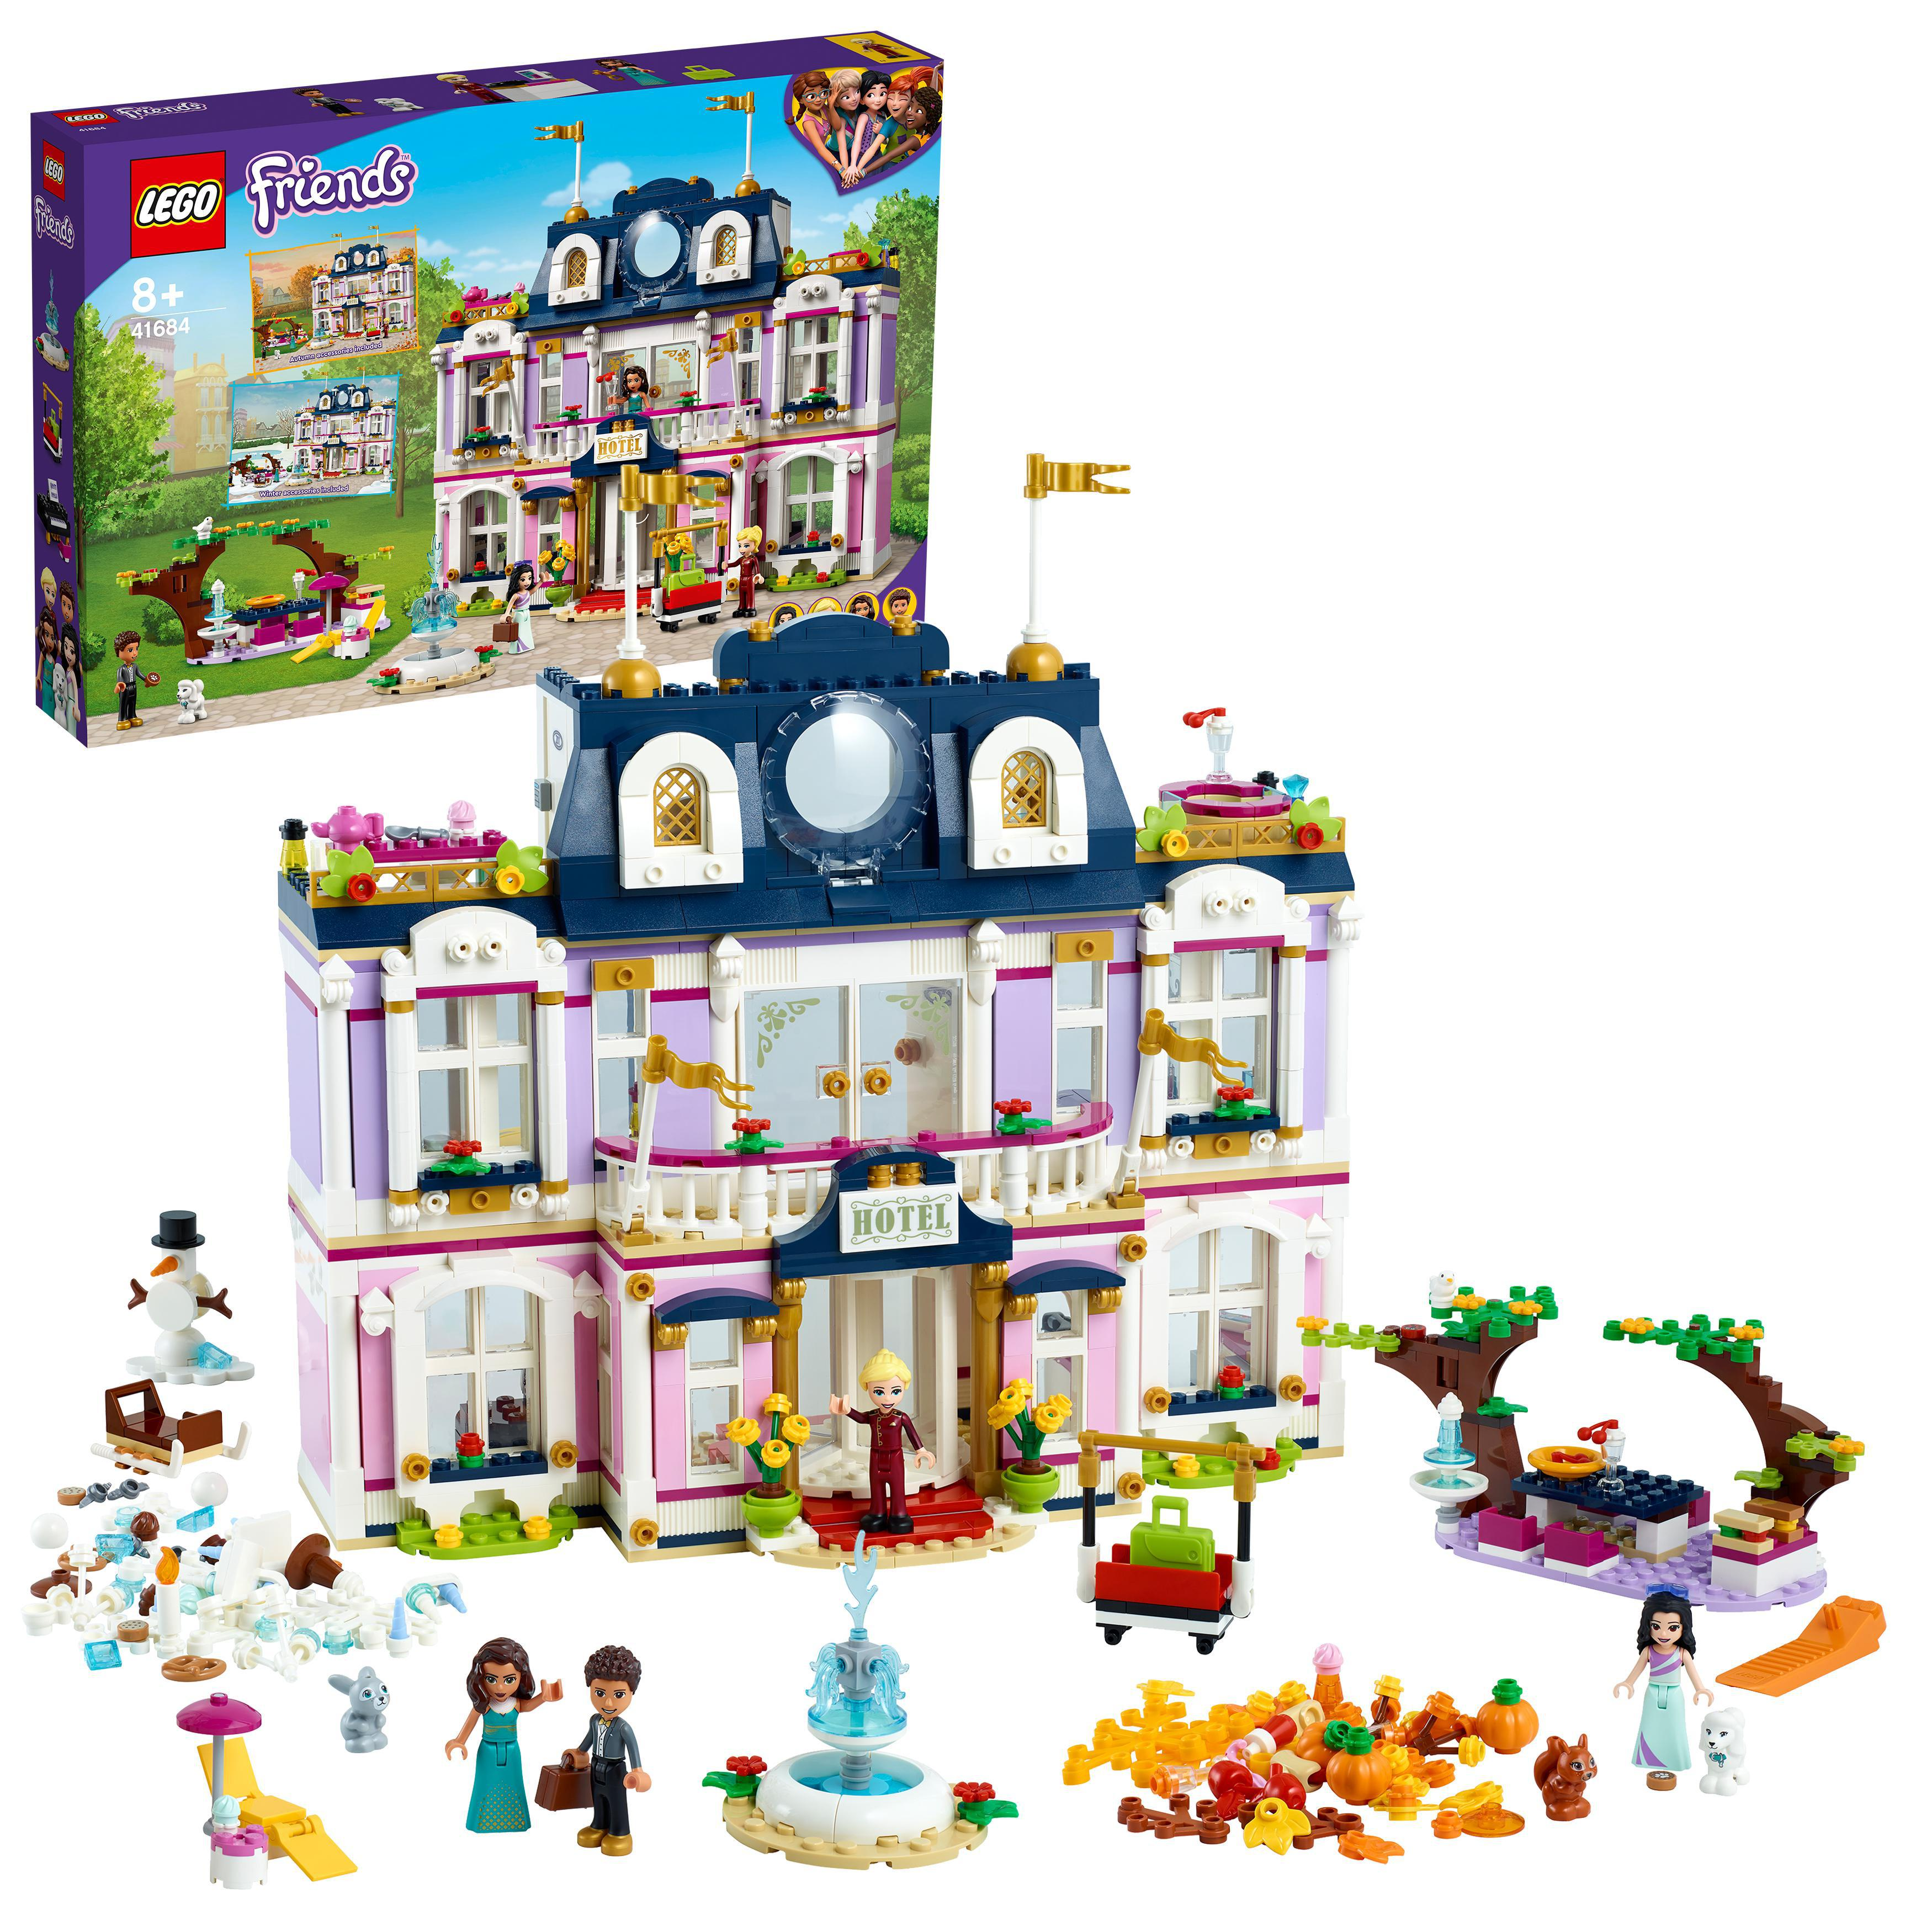 LEGO Friends - Heartlake Grand Hotel (41684)